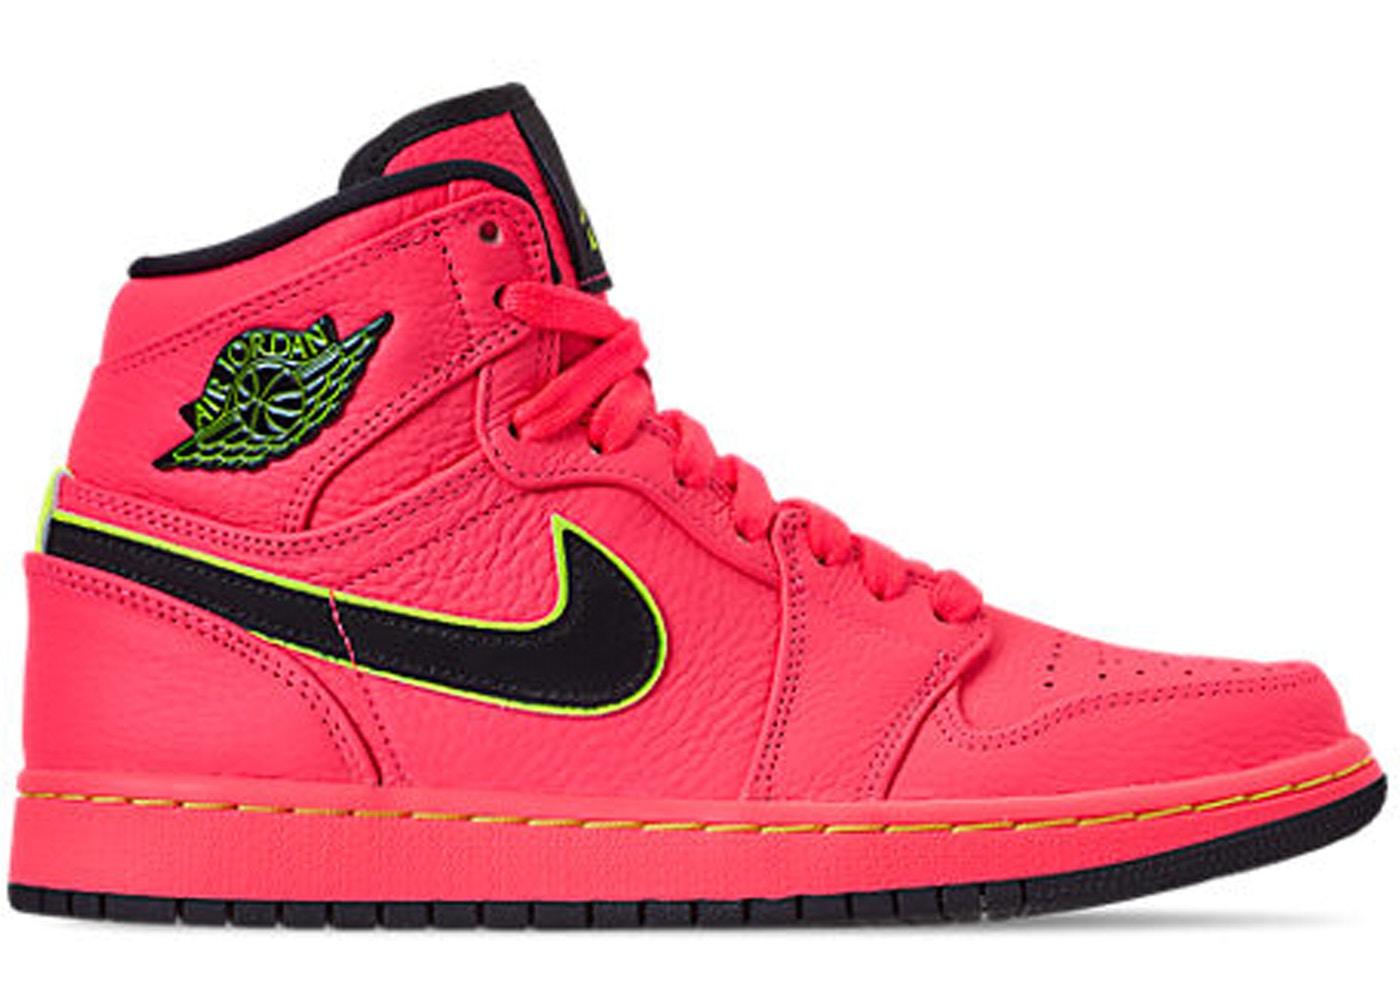 c543d6e7e4f4 Sell. or Ask. Size  12W. View All Bids. Jordan 1 Retro High Hot Punch ...